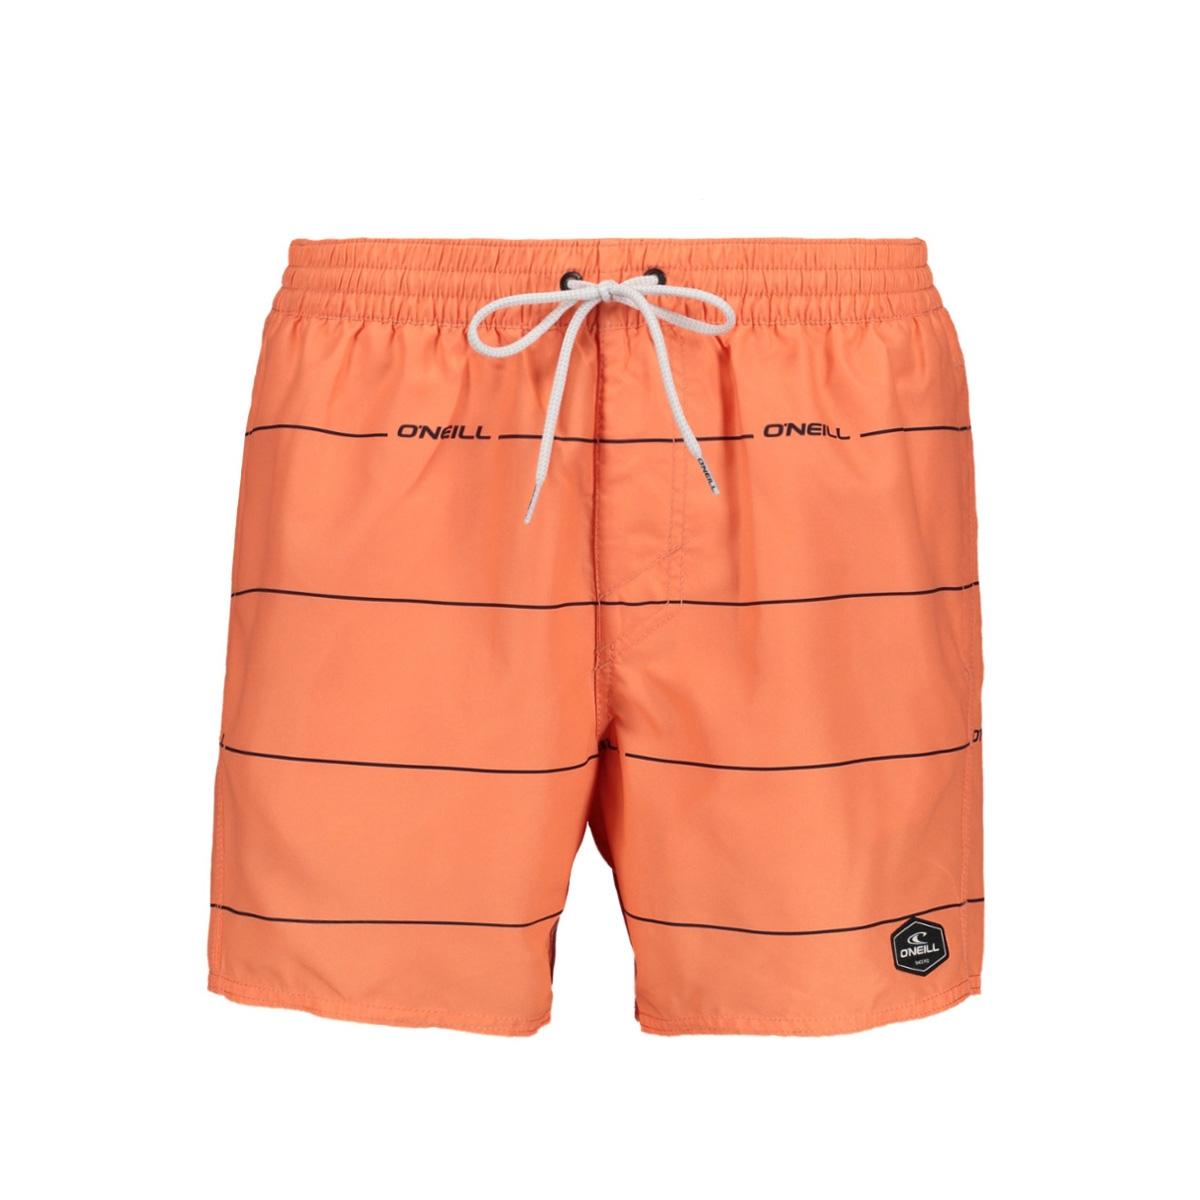 pm controurz shorts 0a3224 o`neill korte broek 4990 pink aop